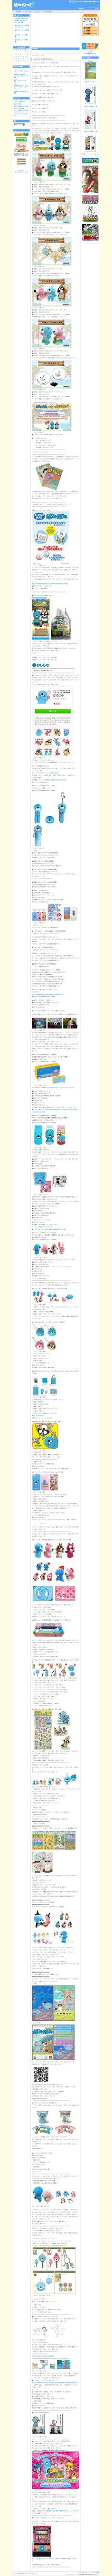 The website 'http://www.bonobono.jp/ ' courtesy of @Pinstamatic (http://pinstamatic.com)